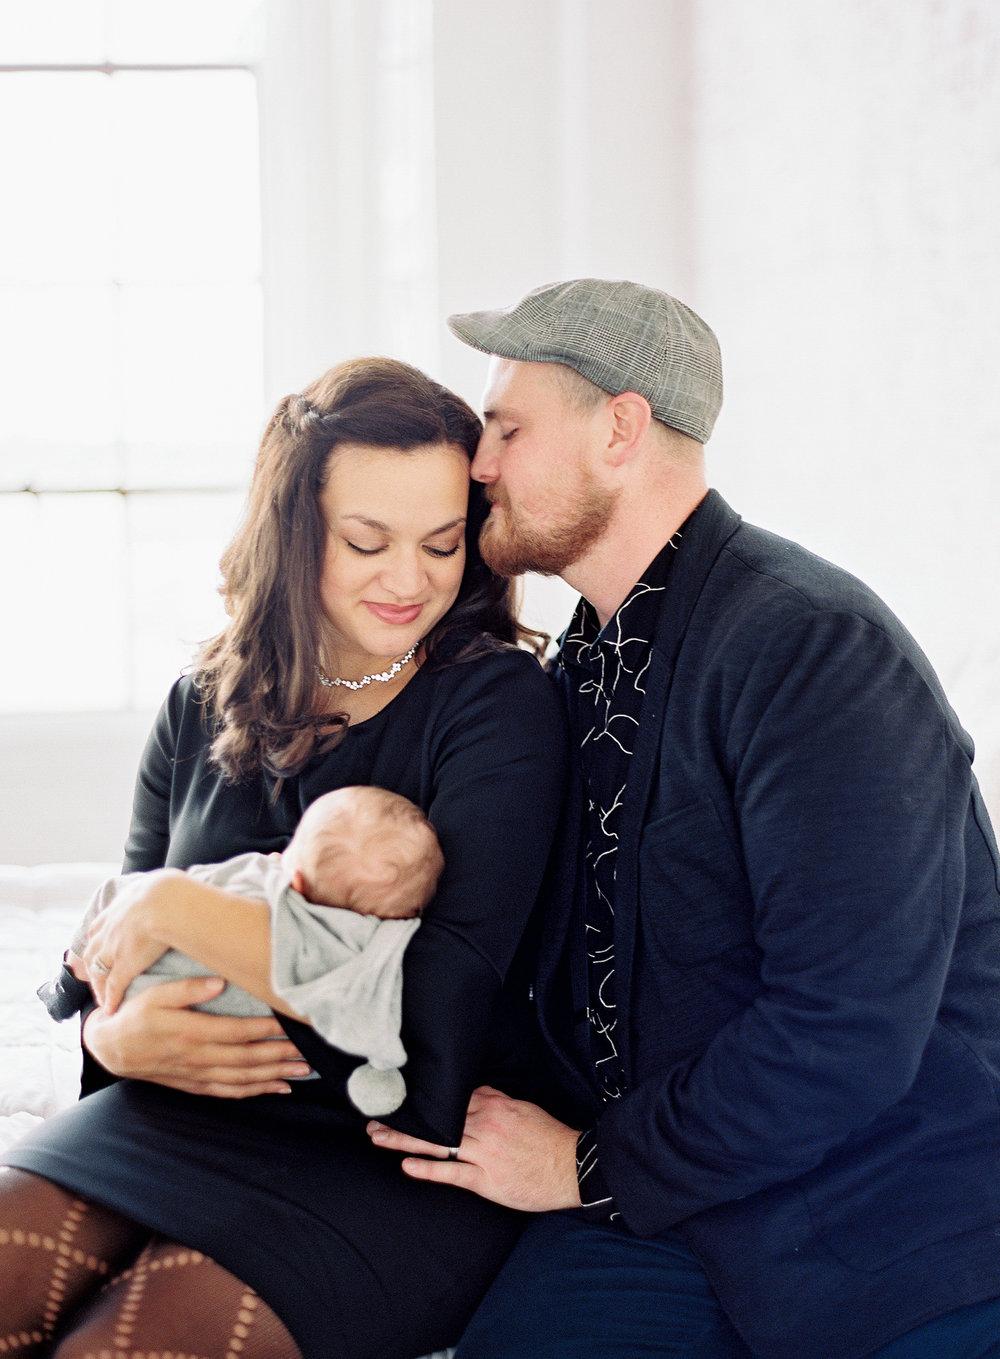 pittsburgh-newborn-family-photographer-Steven-Dray-family-anna-laero-photography-9.jpg